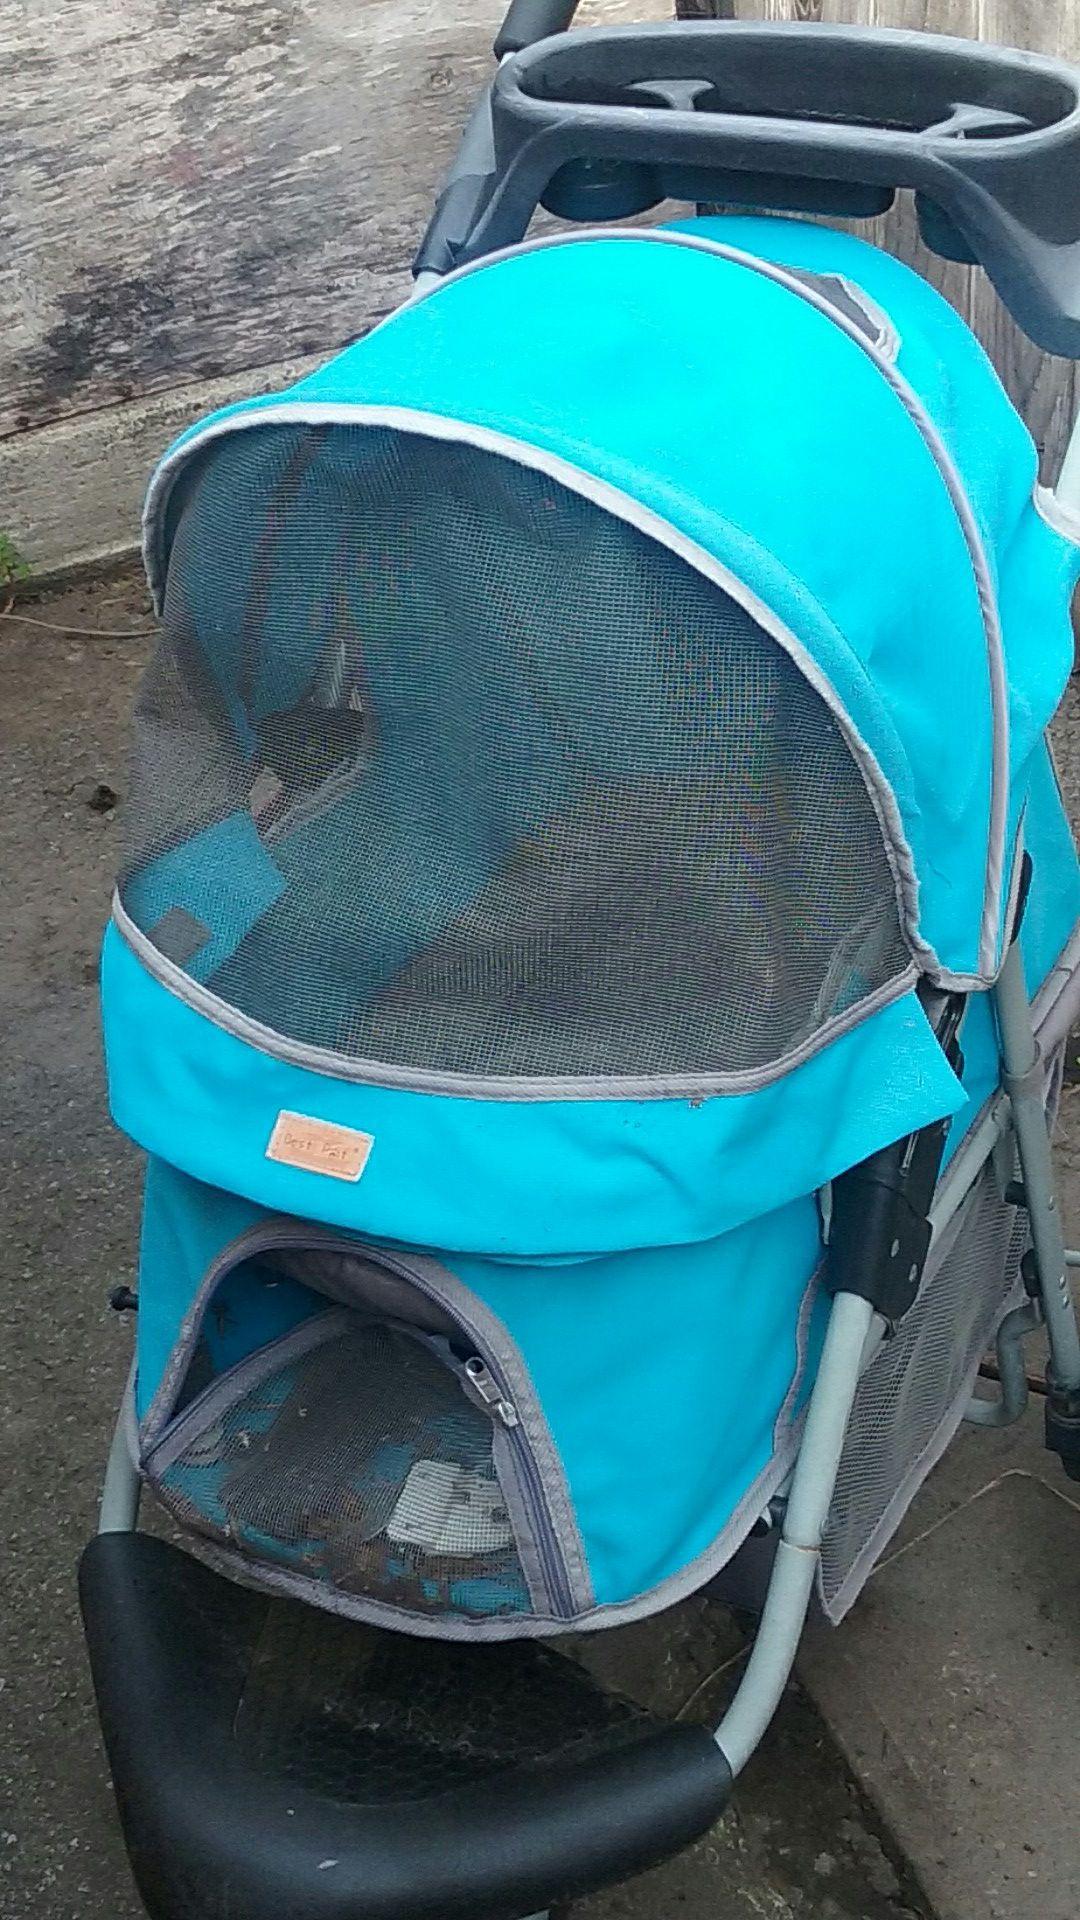 Best Pet Pet stroller good condition